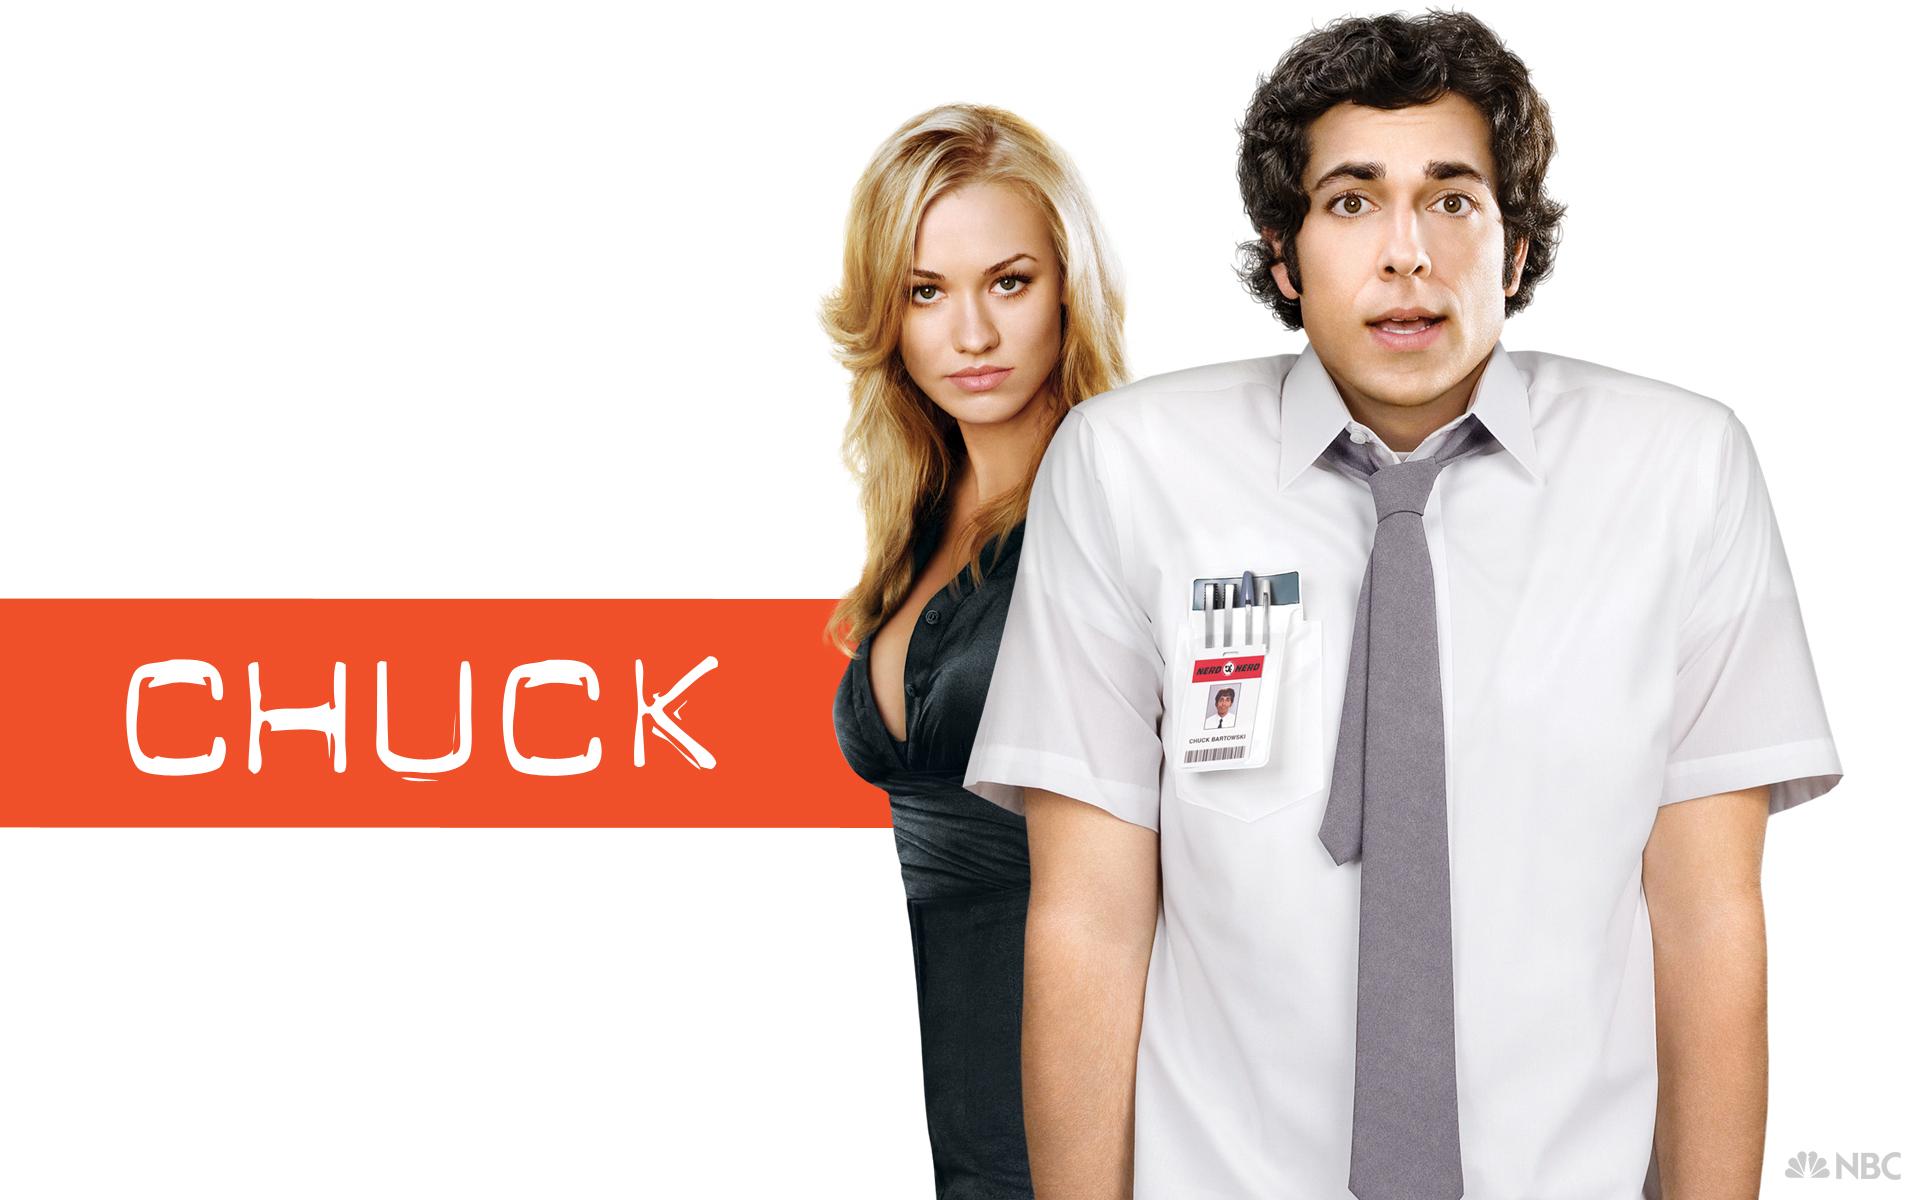 List of Chuck episodes